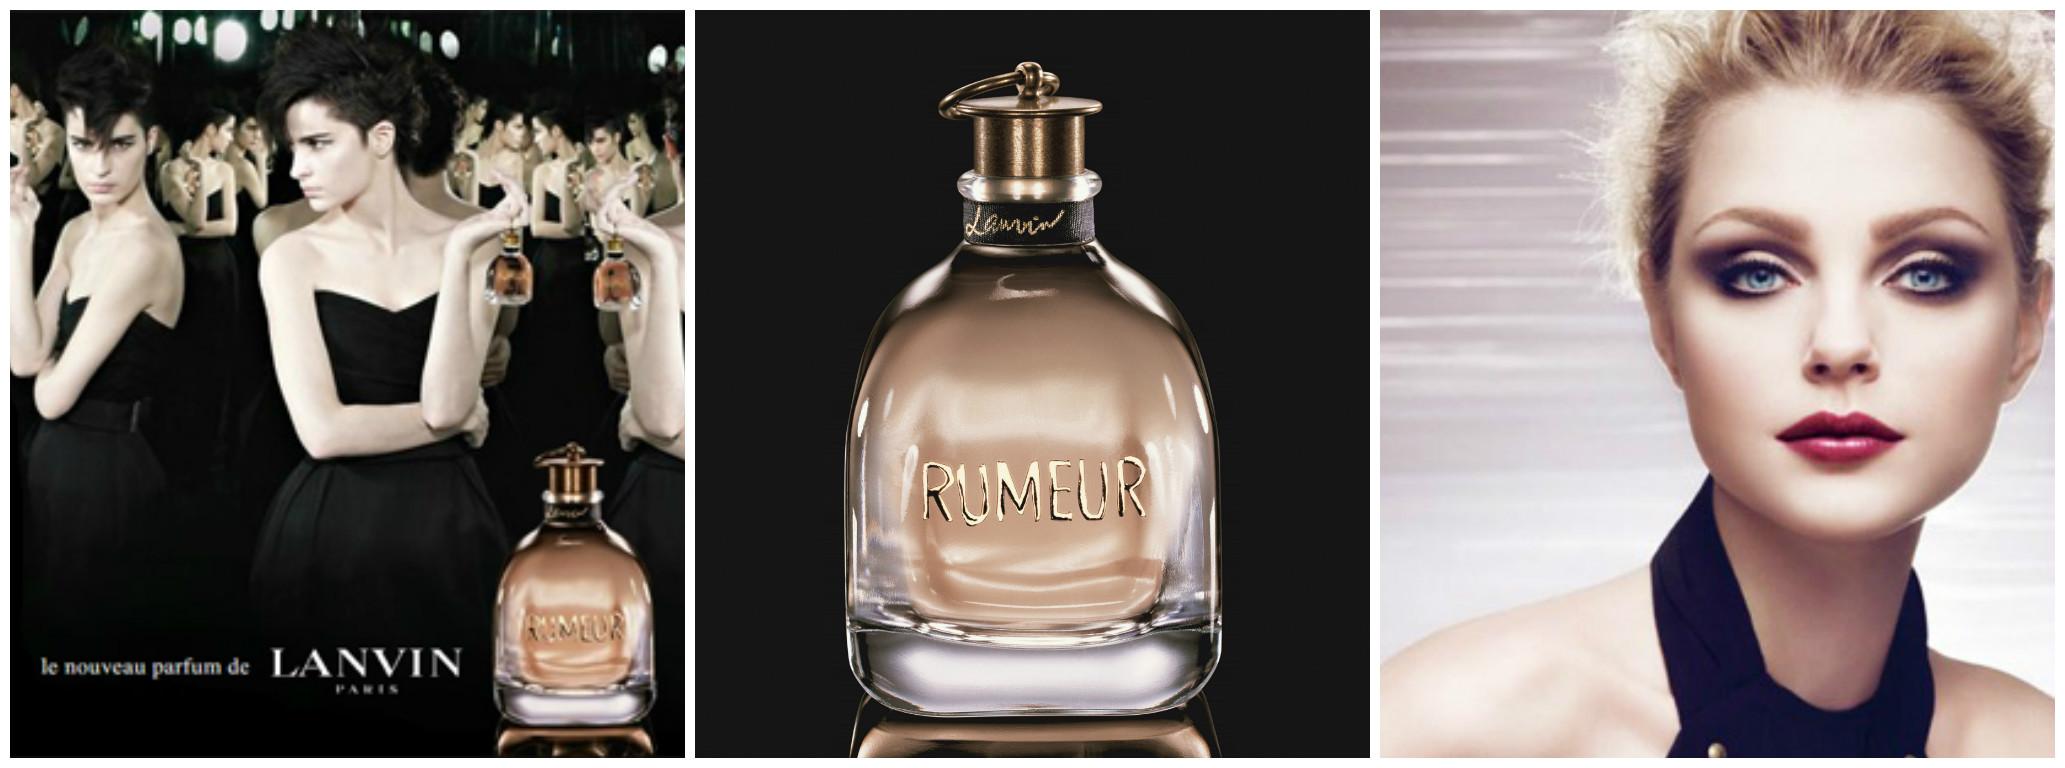 Lanvin Rumeur Perfume Review by Scentbird